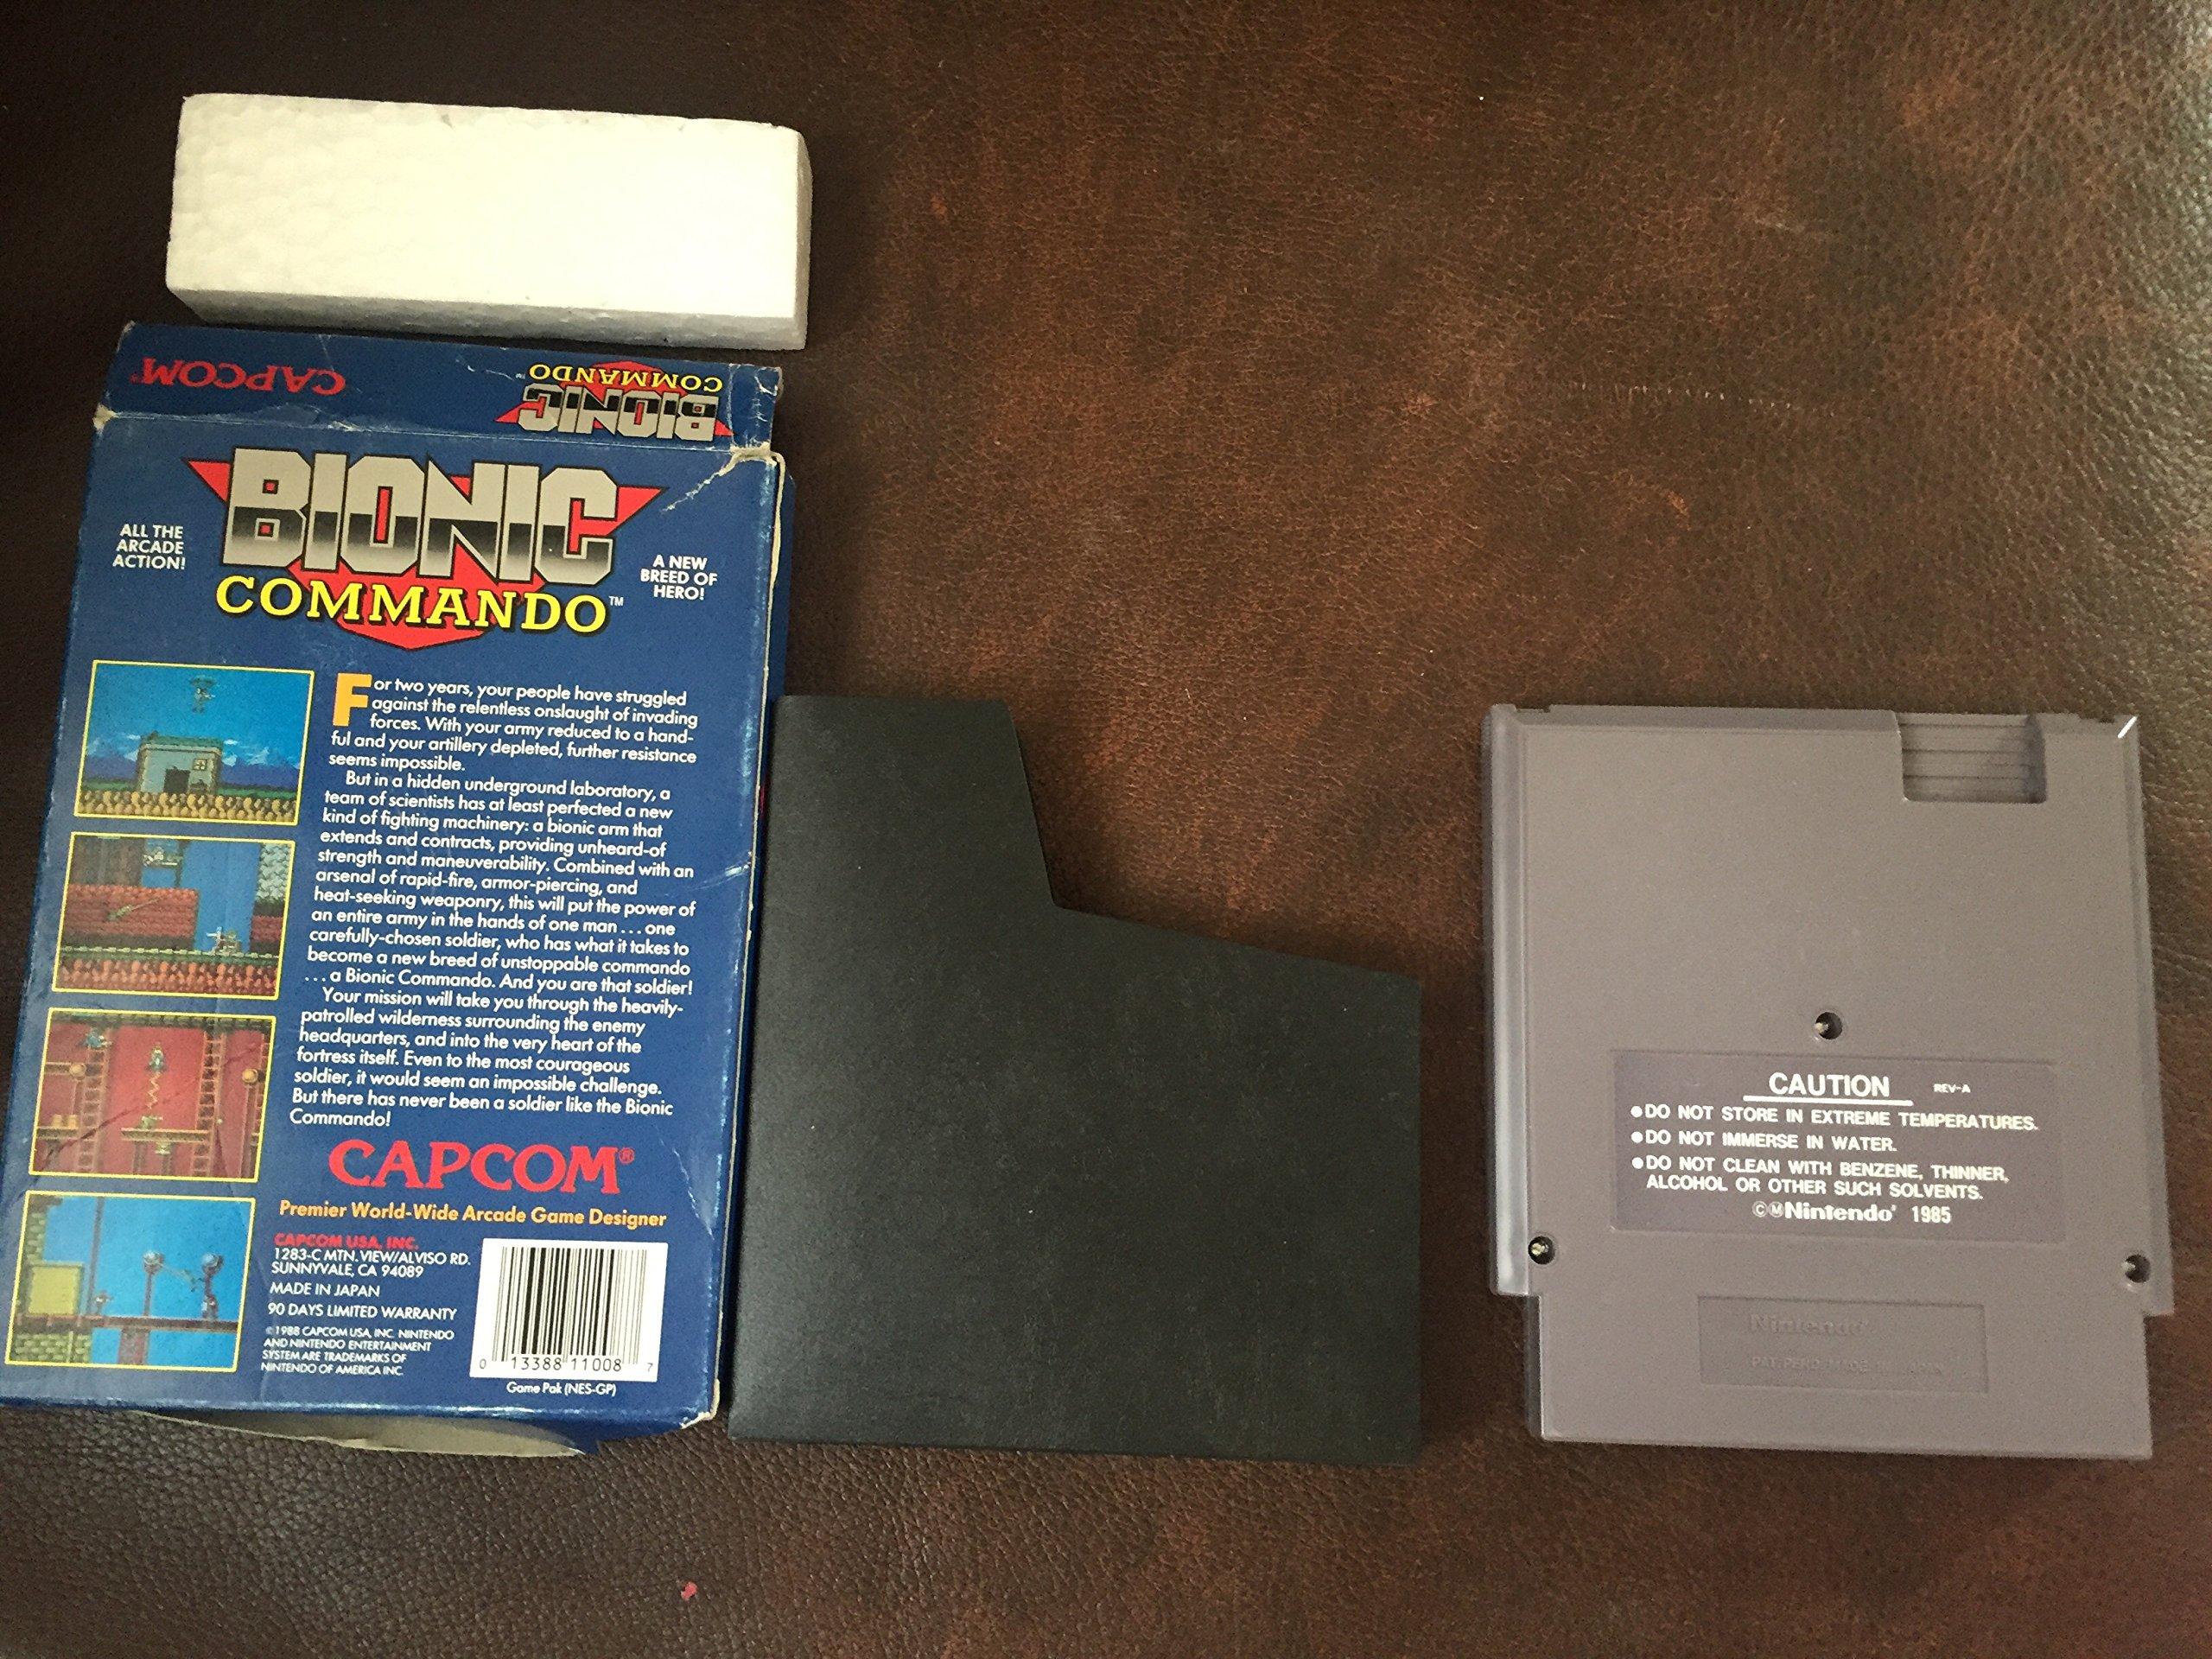 Amazon.com: Bionic Commando - Nintendo NES: Video Games